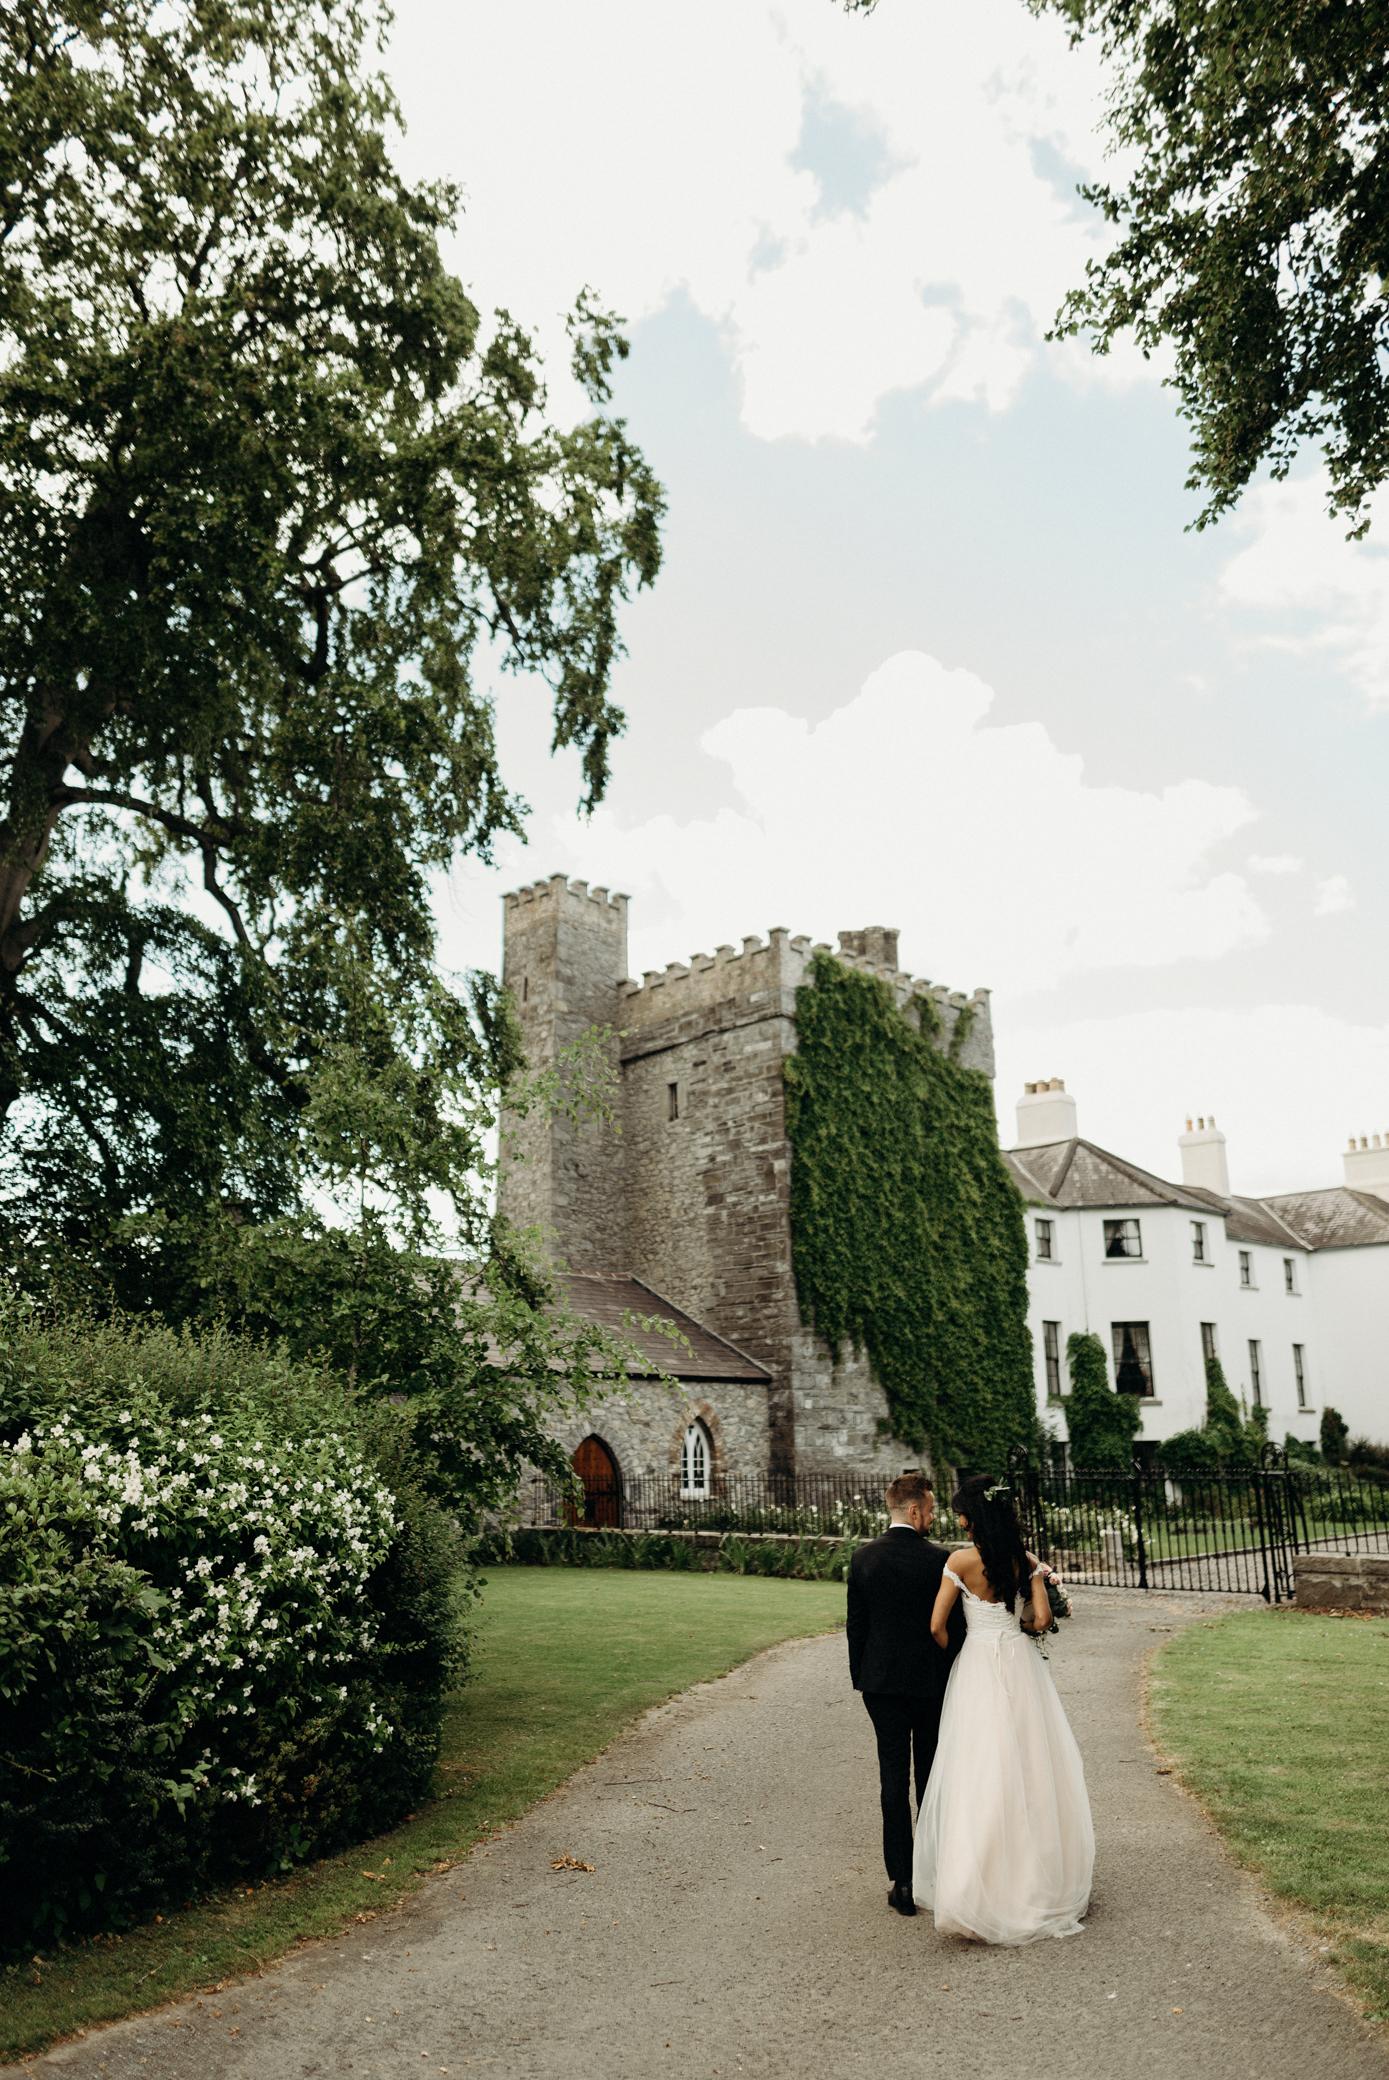 Alan&Naz- Barberstown Castle Wedding - Wedding photographer Ireland-122.jpg